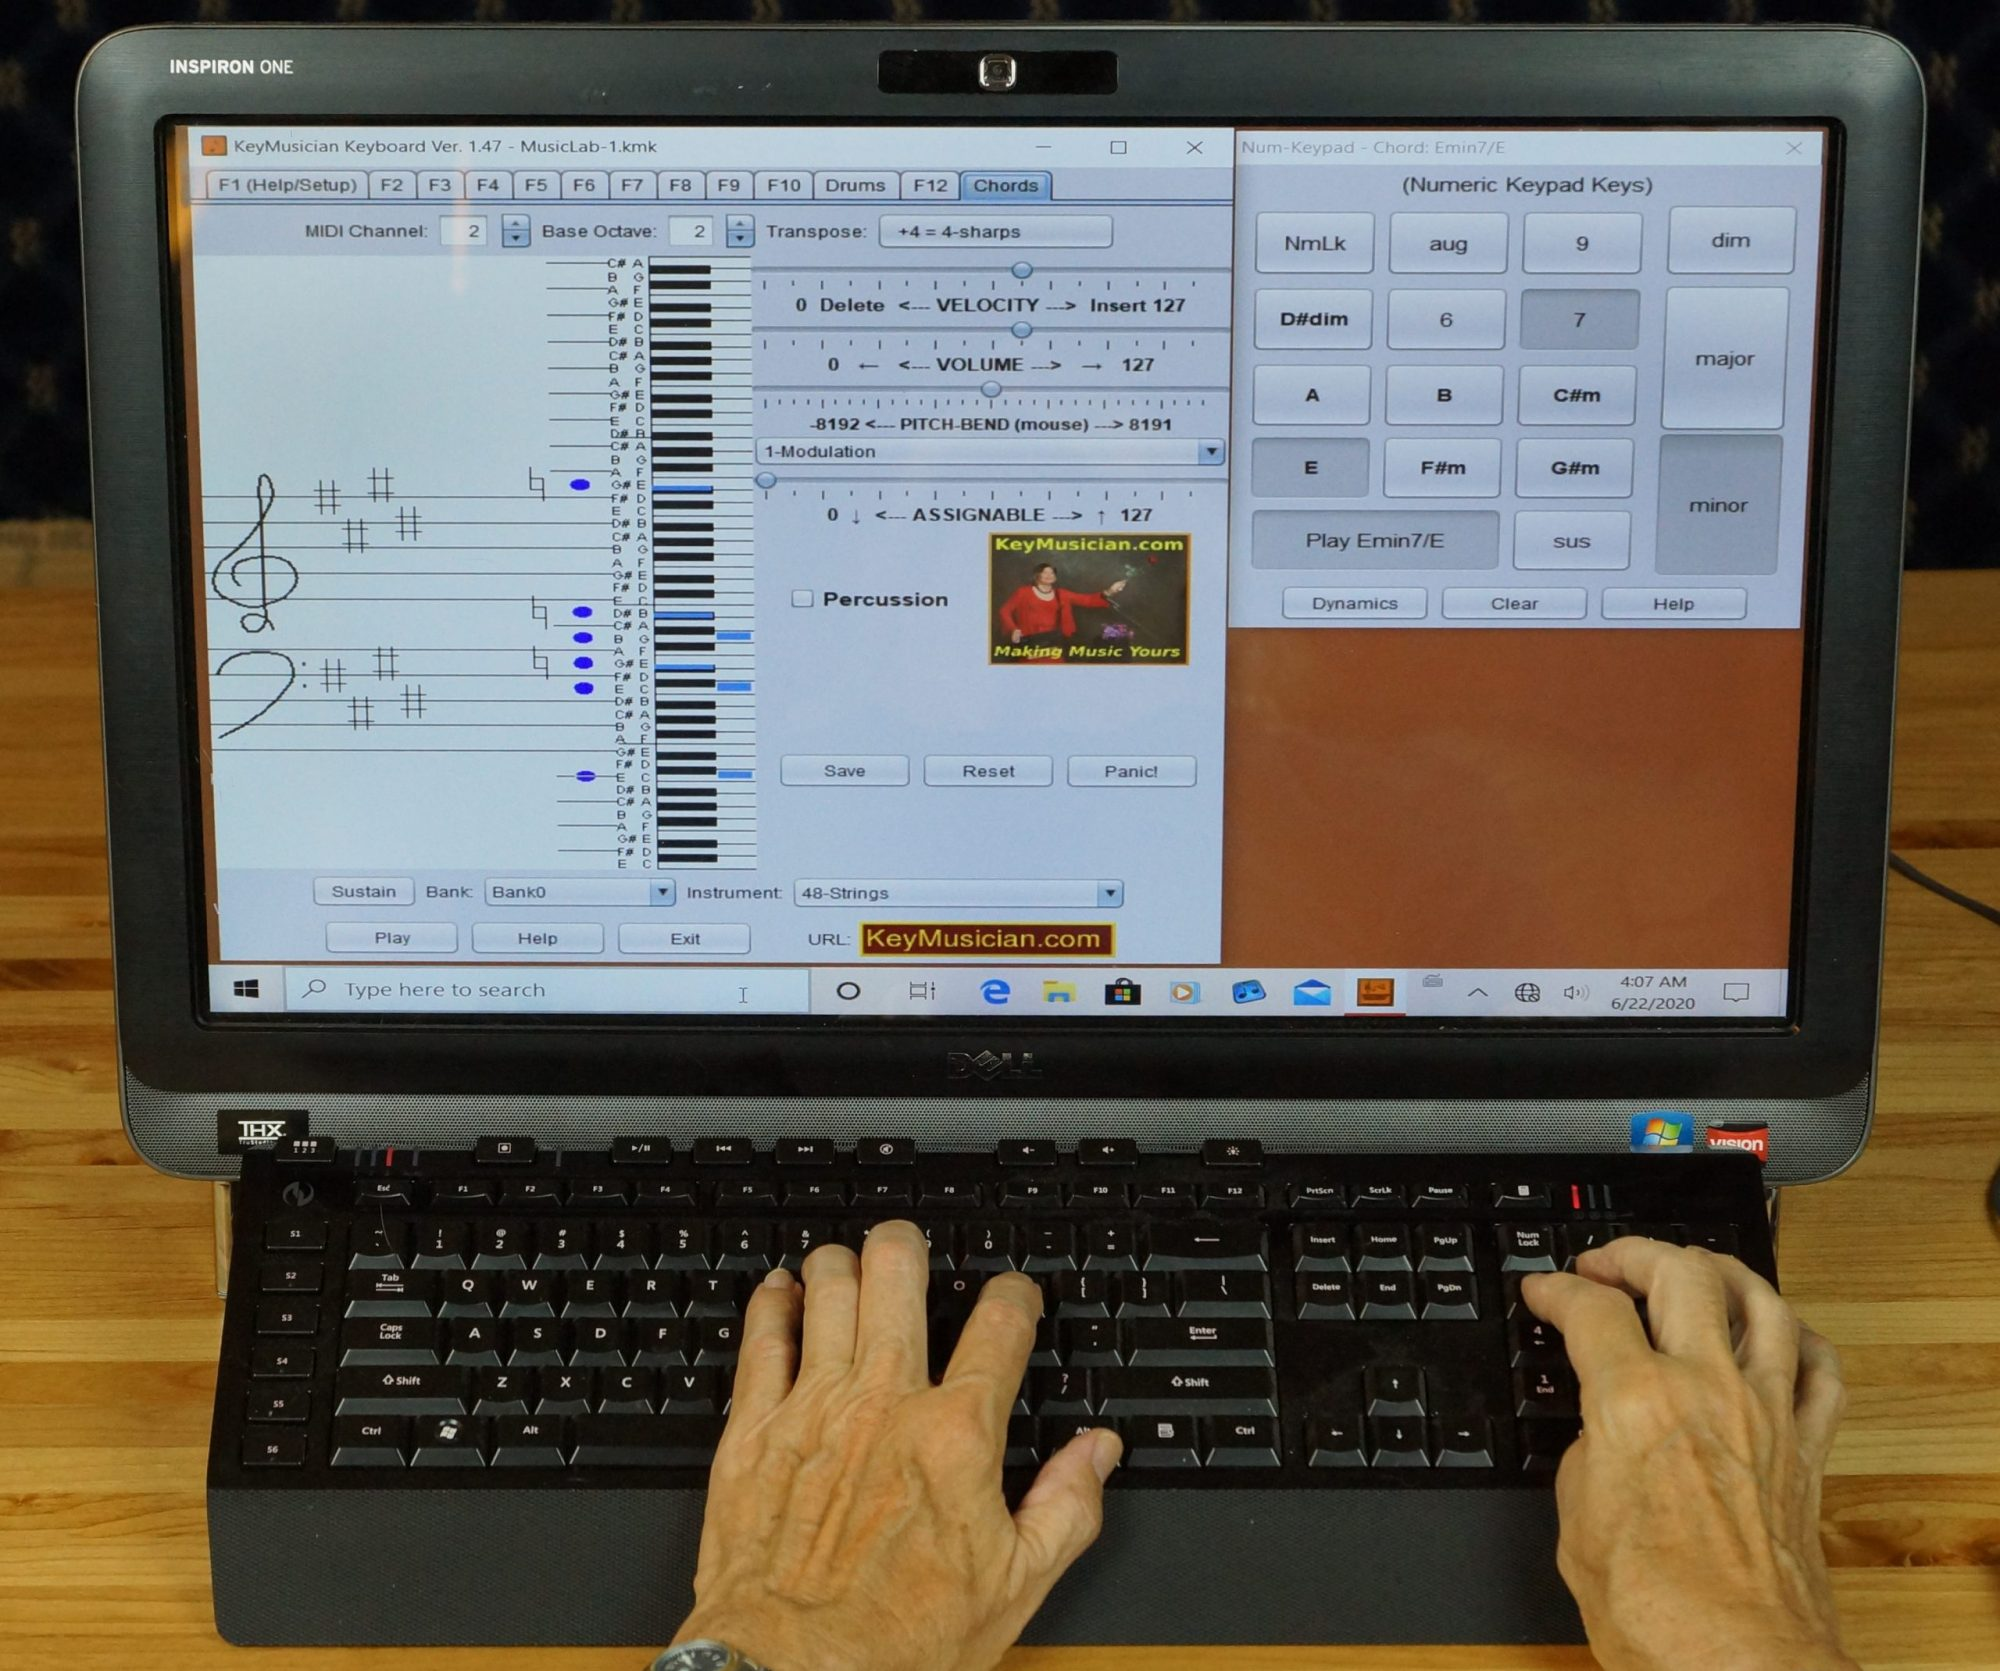 The KeyMusician (tm) Keyboard